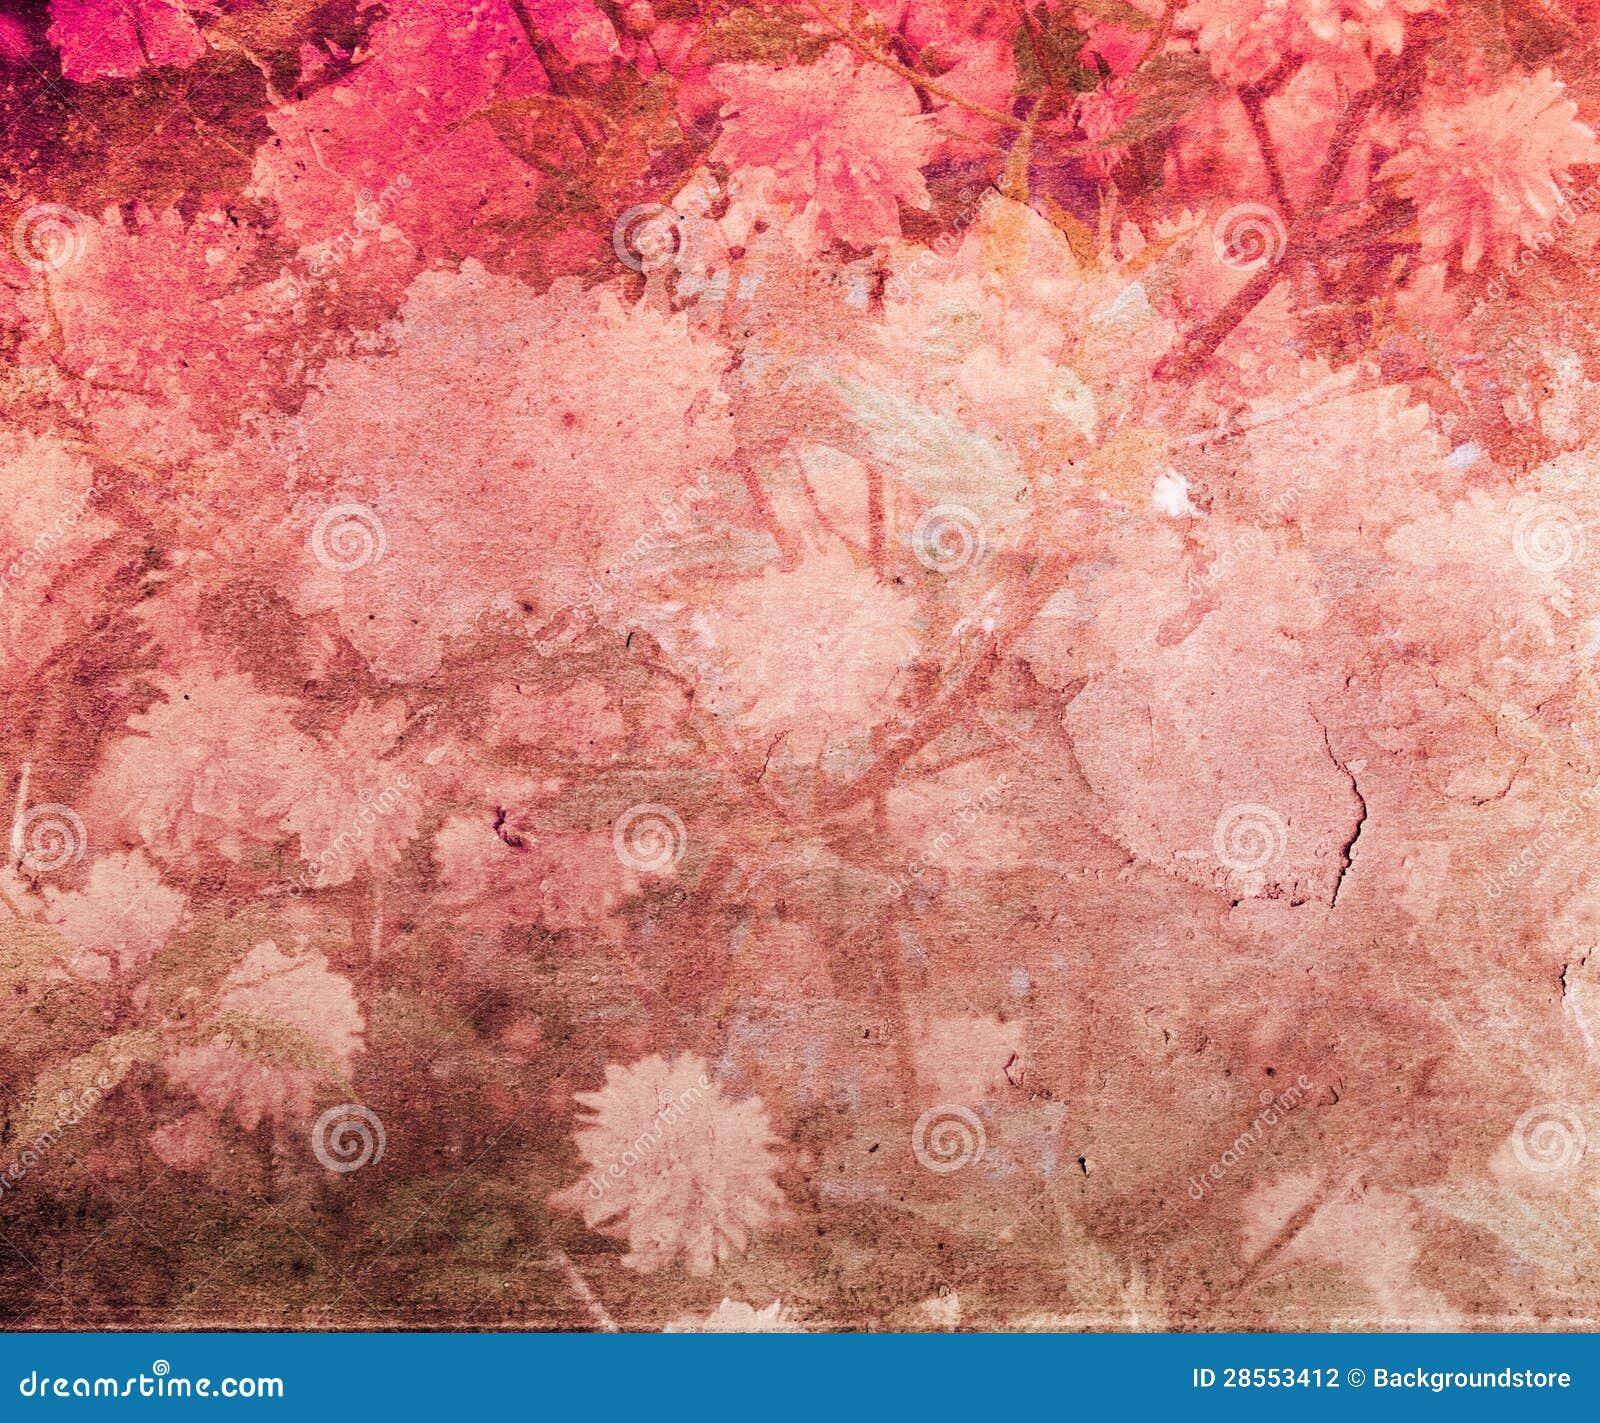 Red Vintage Flower Texture